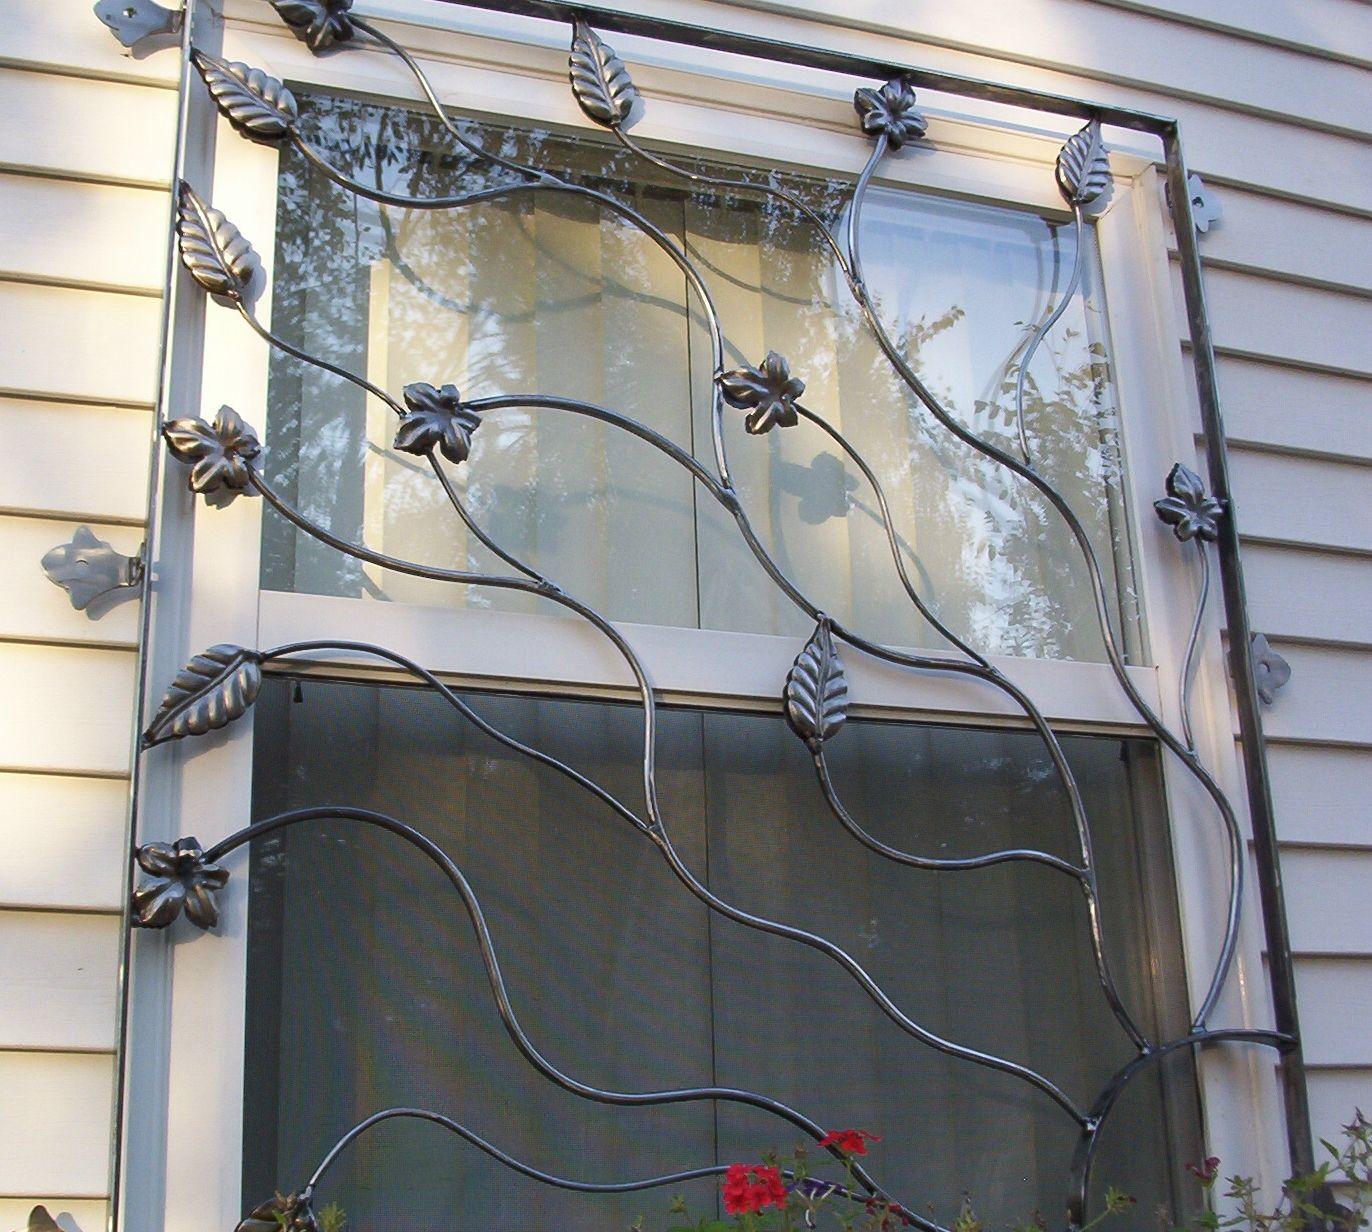 Medium Of Security Bars For Windows